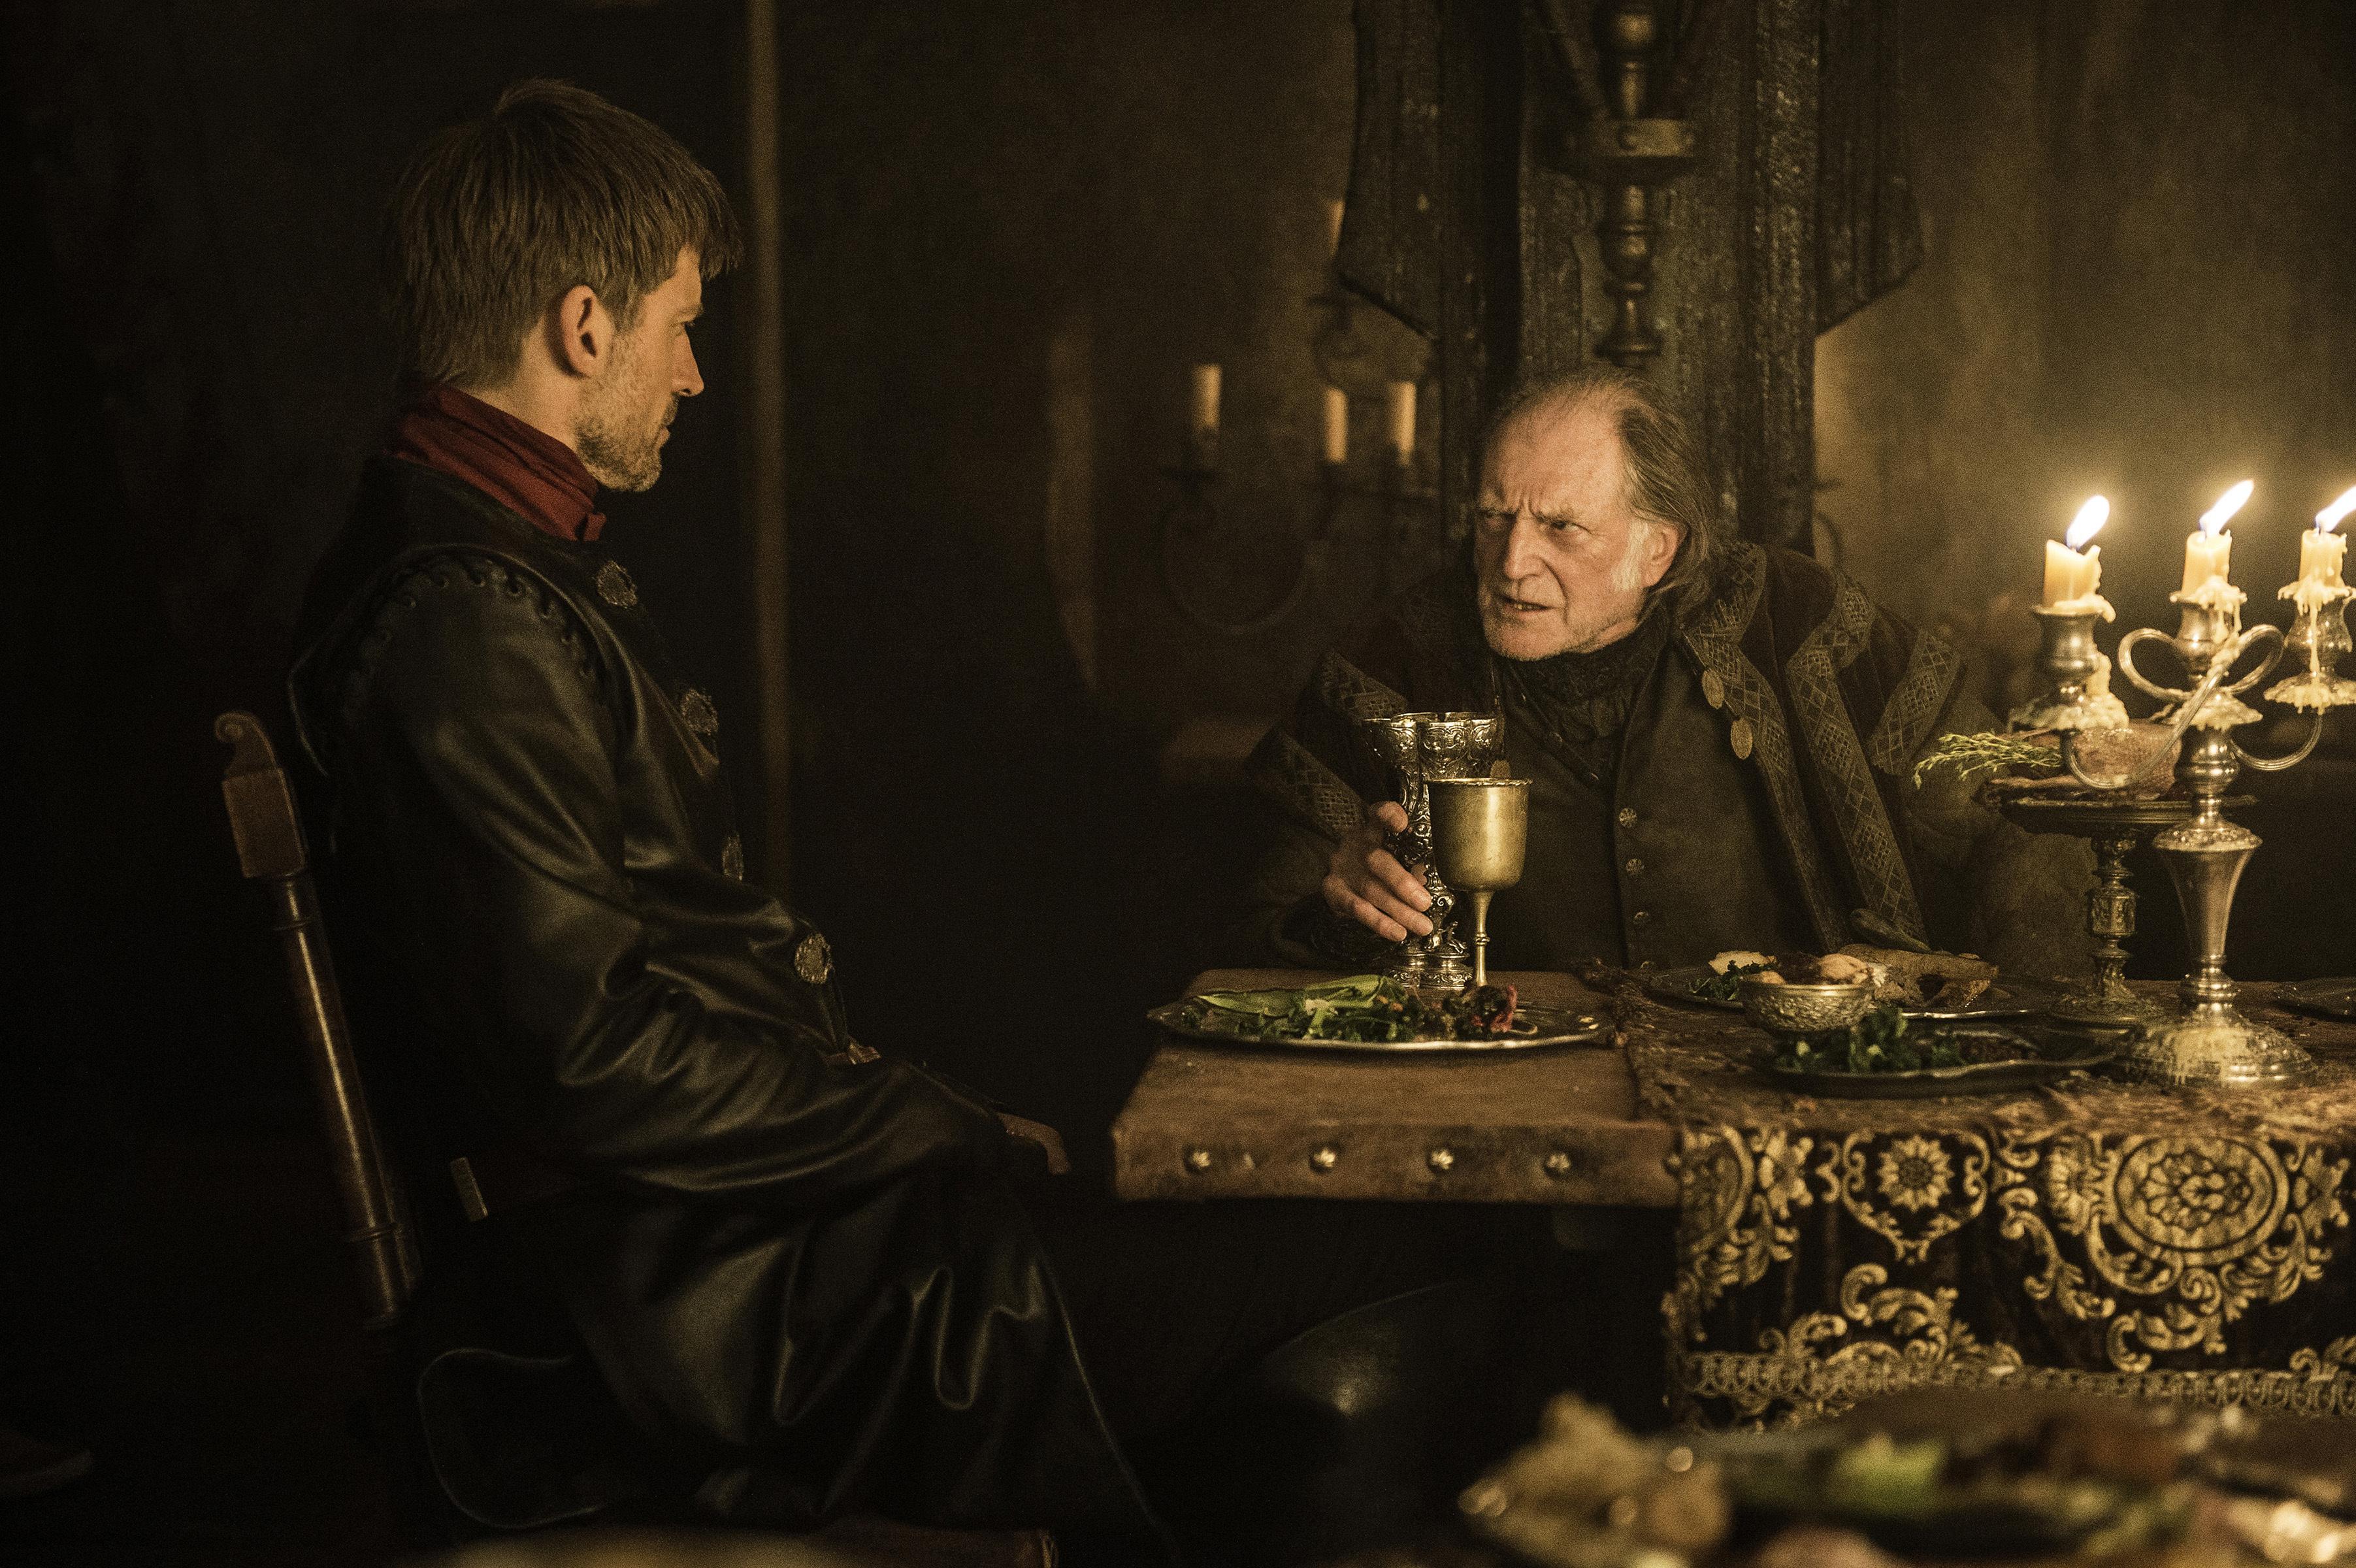 Nikolaj Coster-Waldau and David Bradley in Game of Thrones season 6, episode 10.